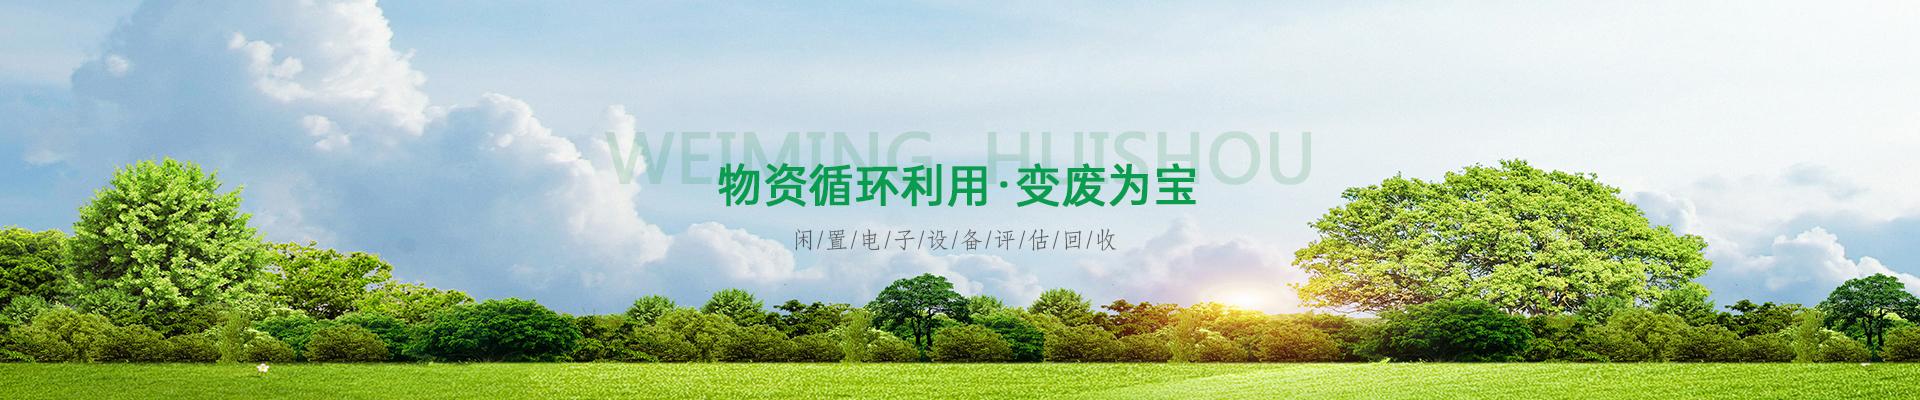 http://www.hongshenghuishou.com/data/upload/202011/20201110140125_590.jpg